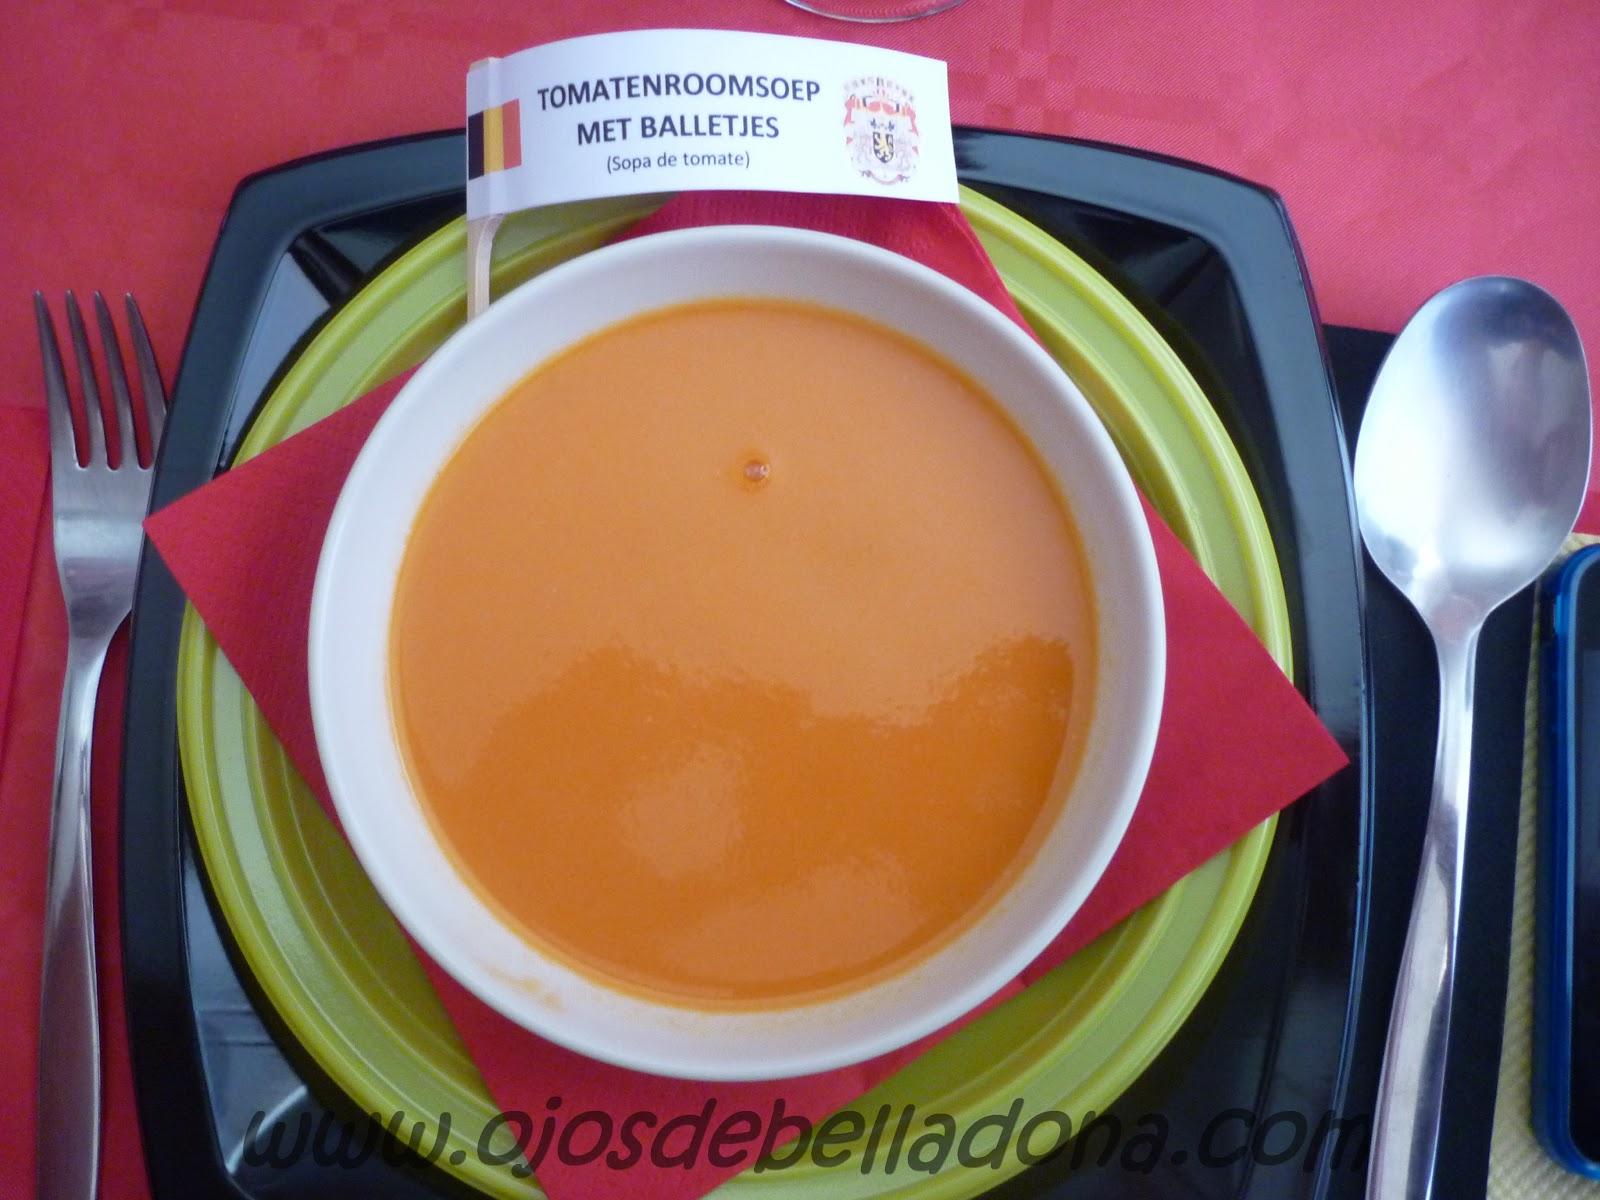 Tomatenroomsoep met balletjes (Sopa de tomate) Bélgica